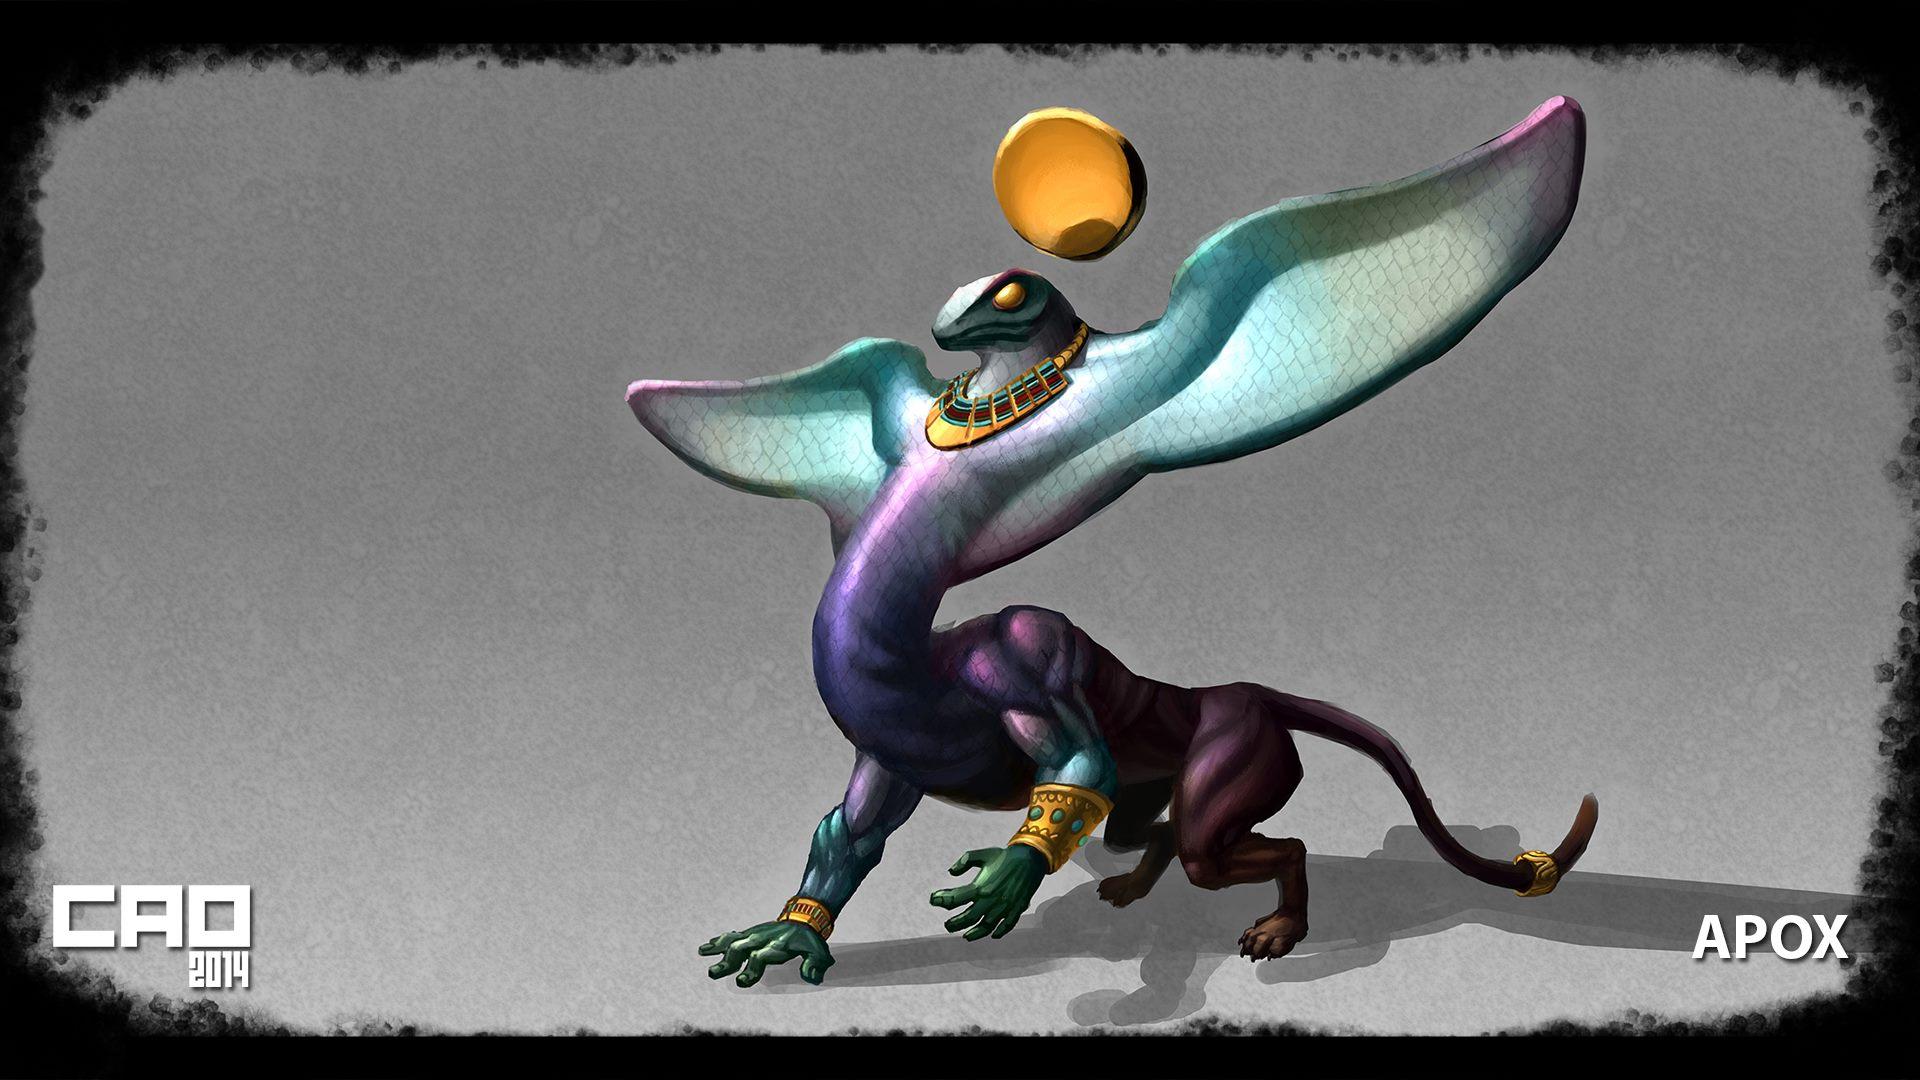 The Apox - Guardian of the Nexus Between Worlds